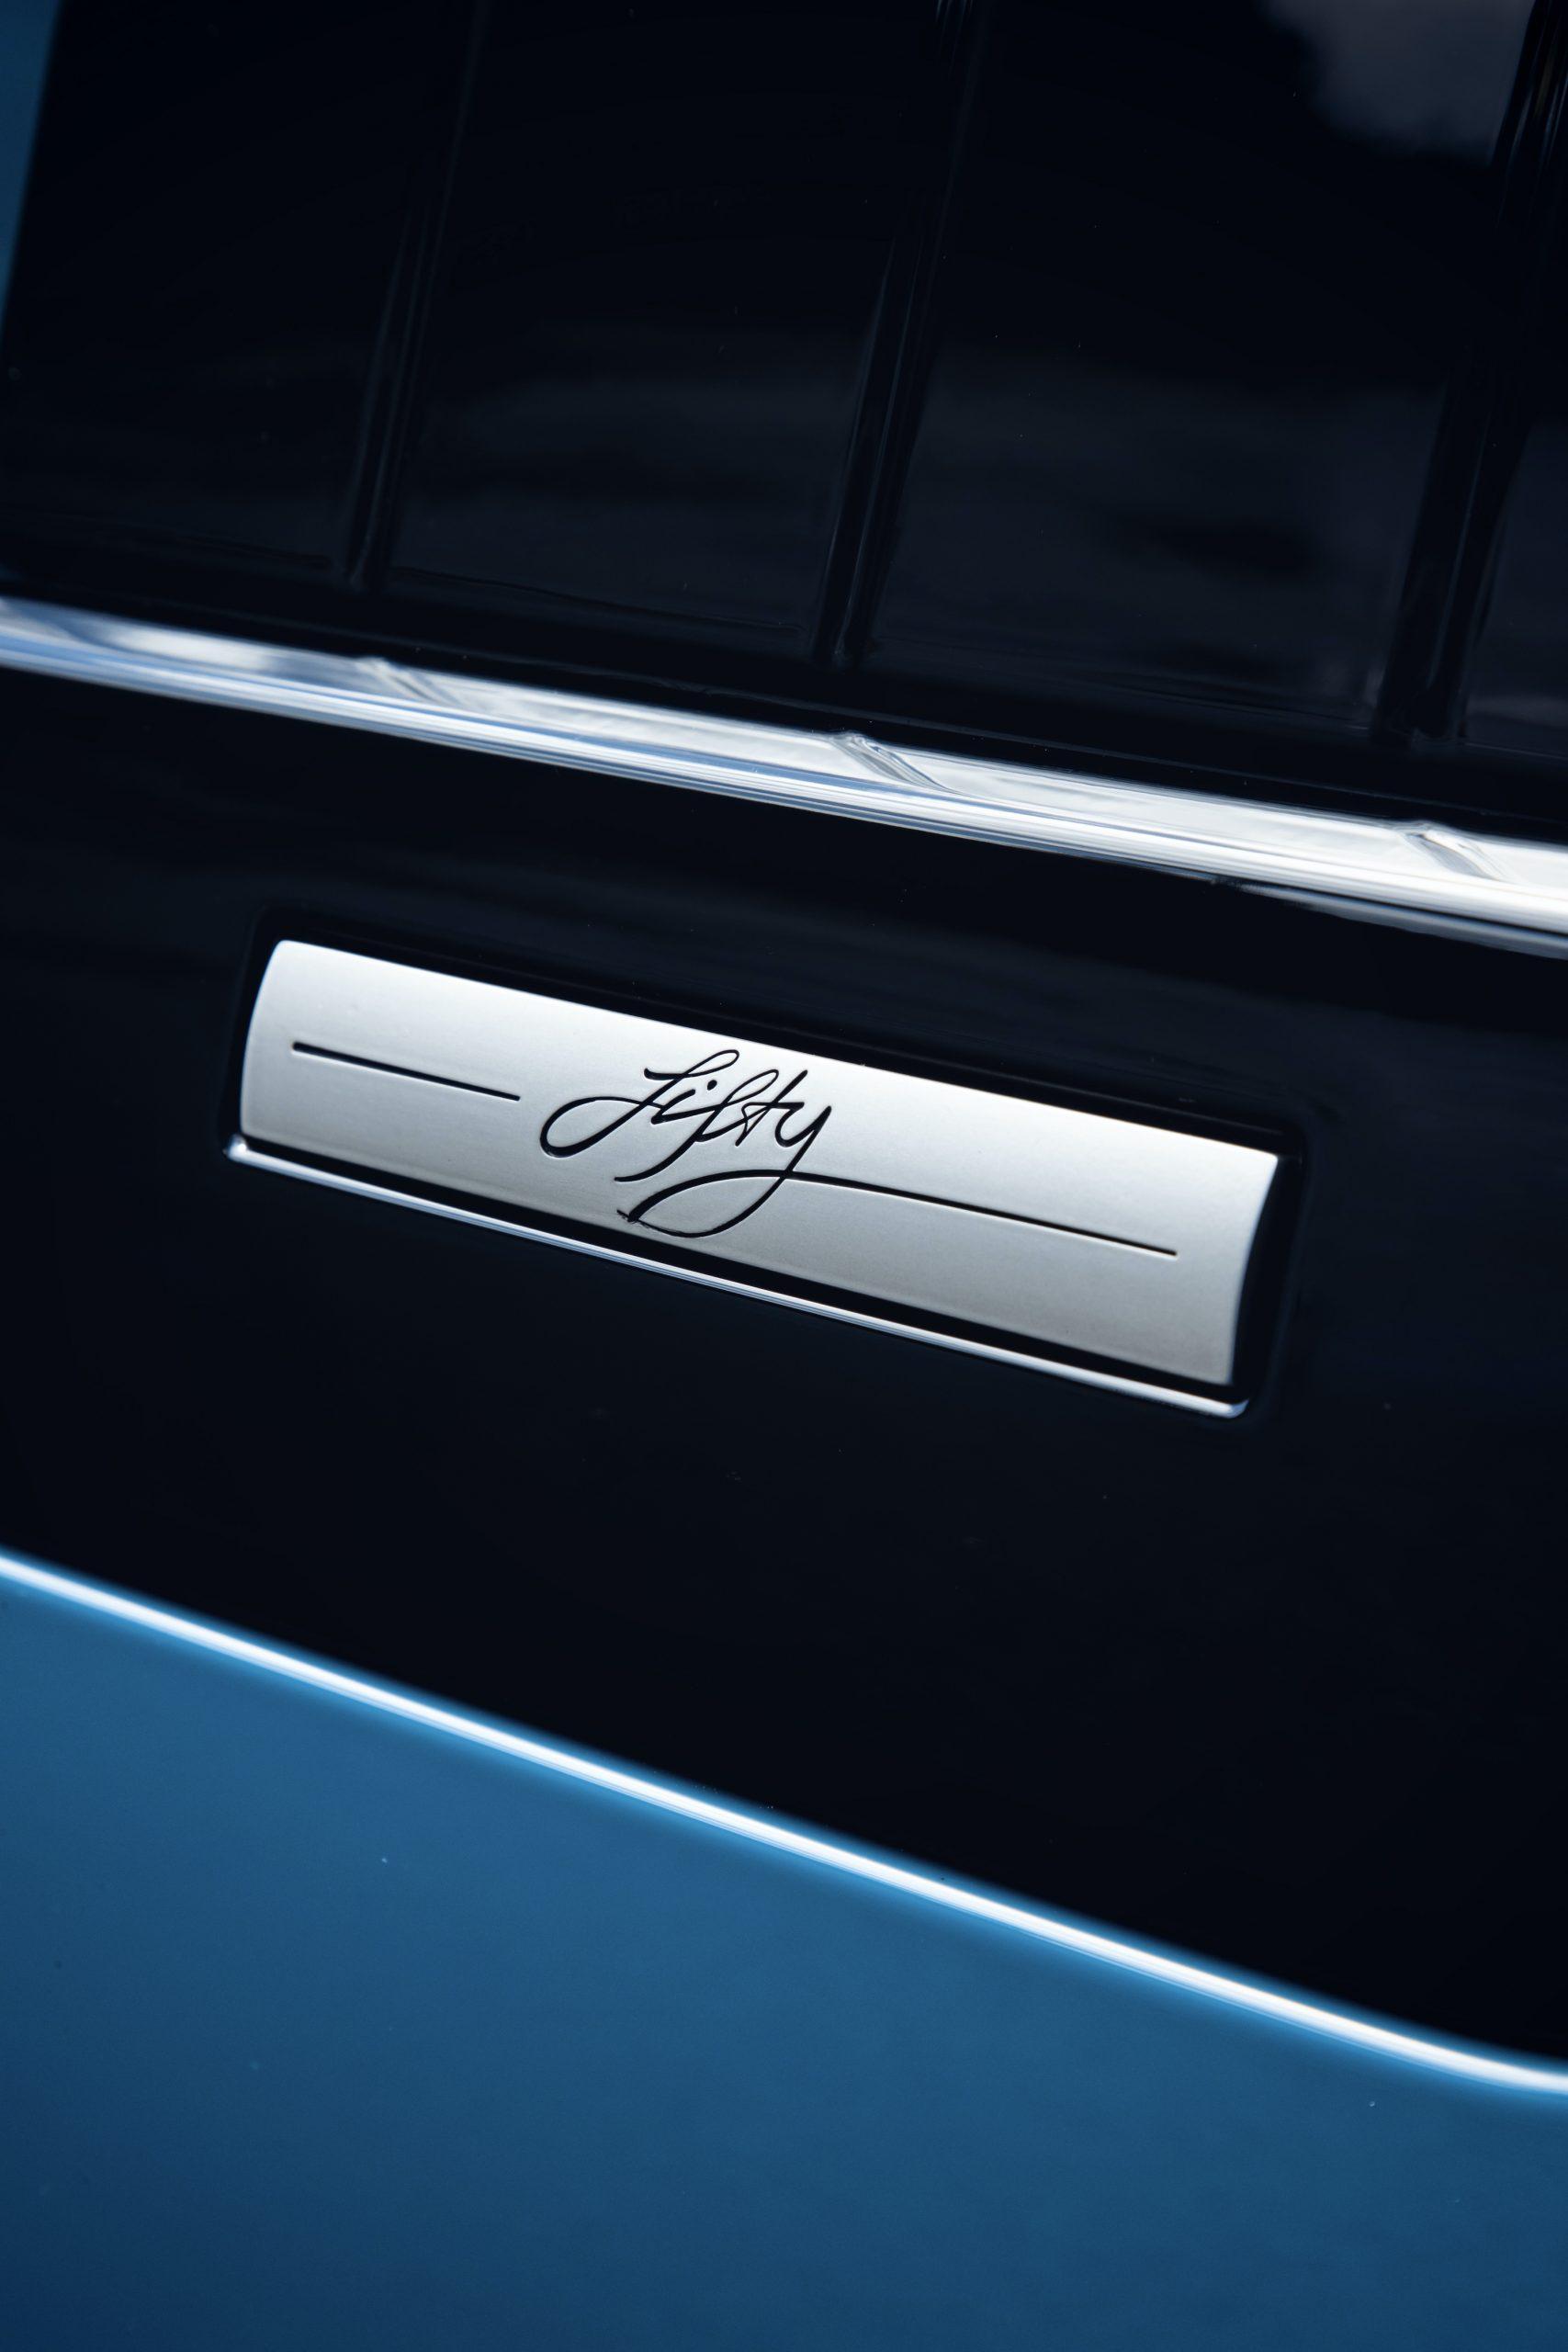 2021 Range Rover Badge Close